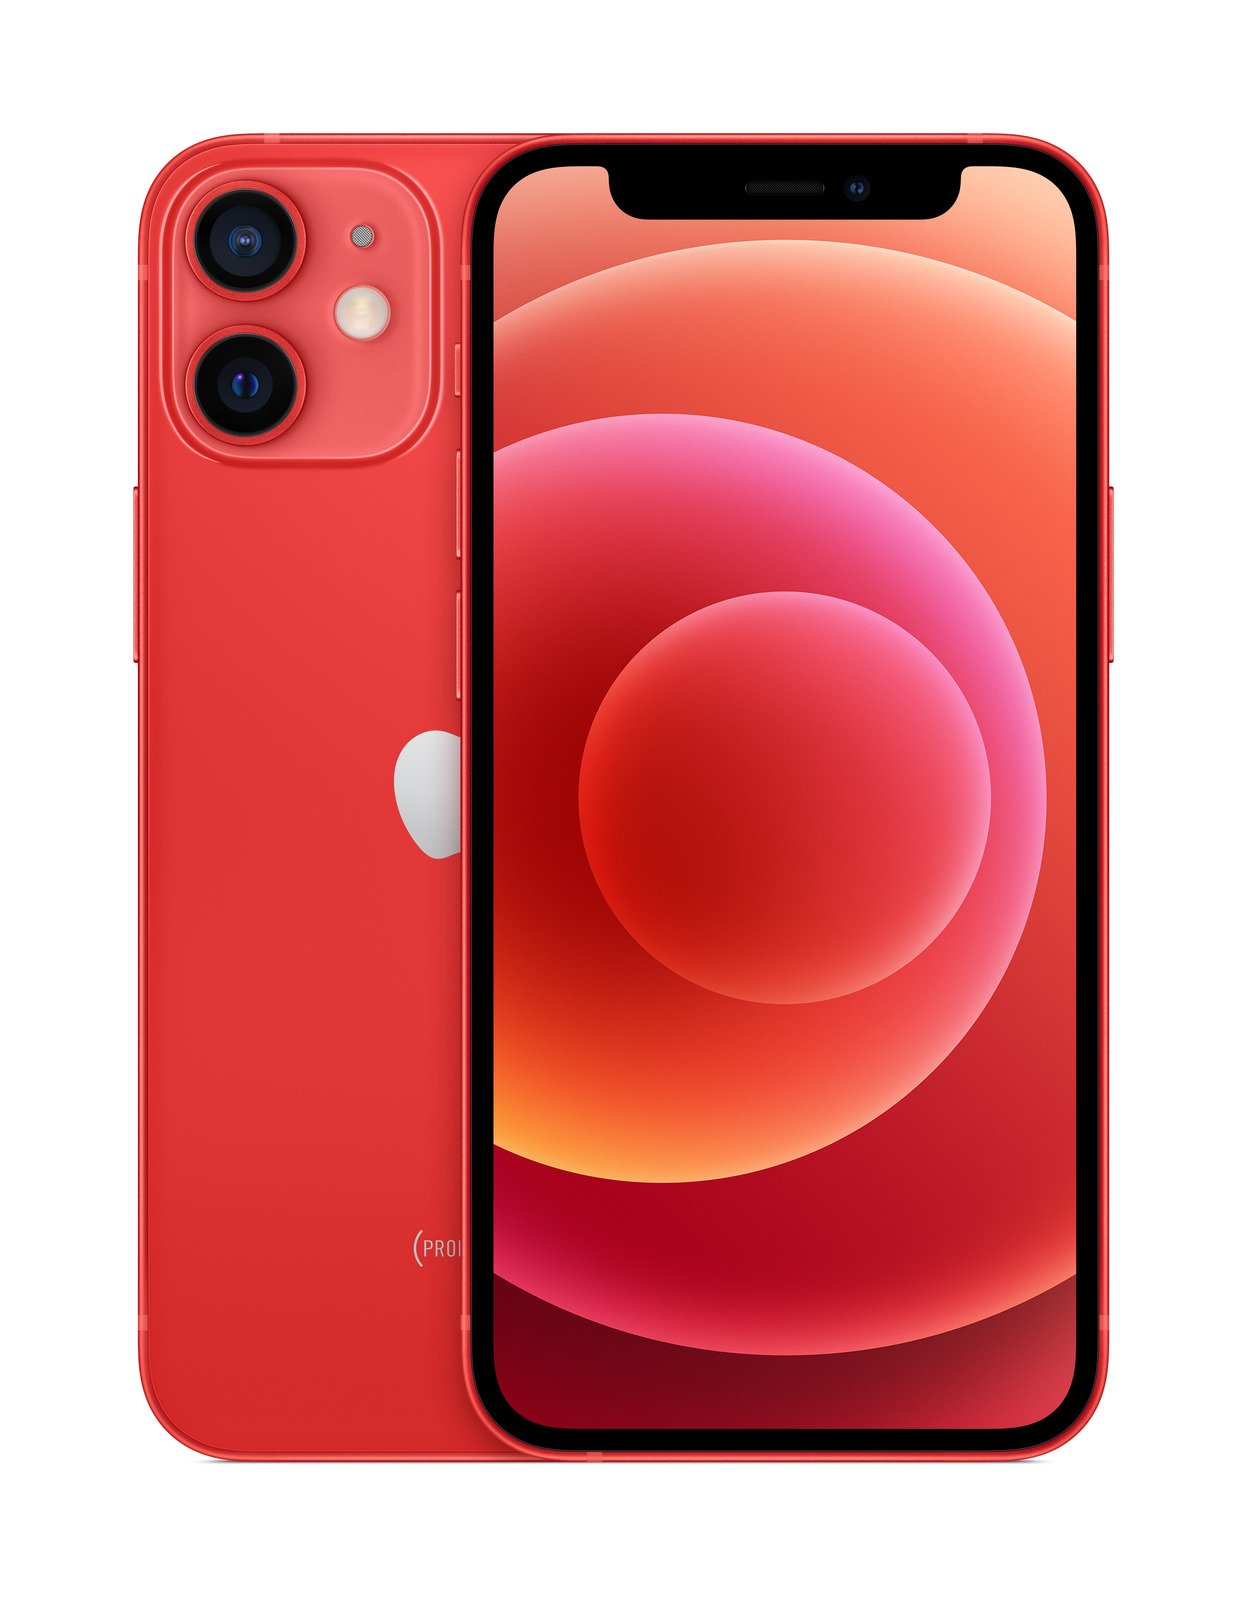 Apple iPhone 12 mini 128GB, Handy (Product Red, iOS) Mobilais Telefons